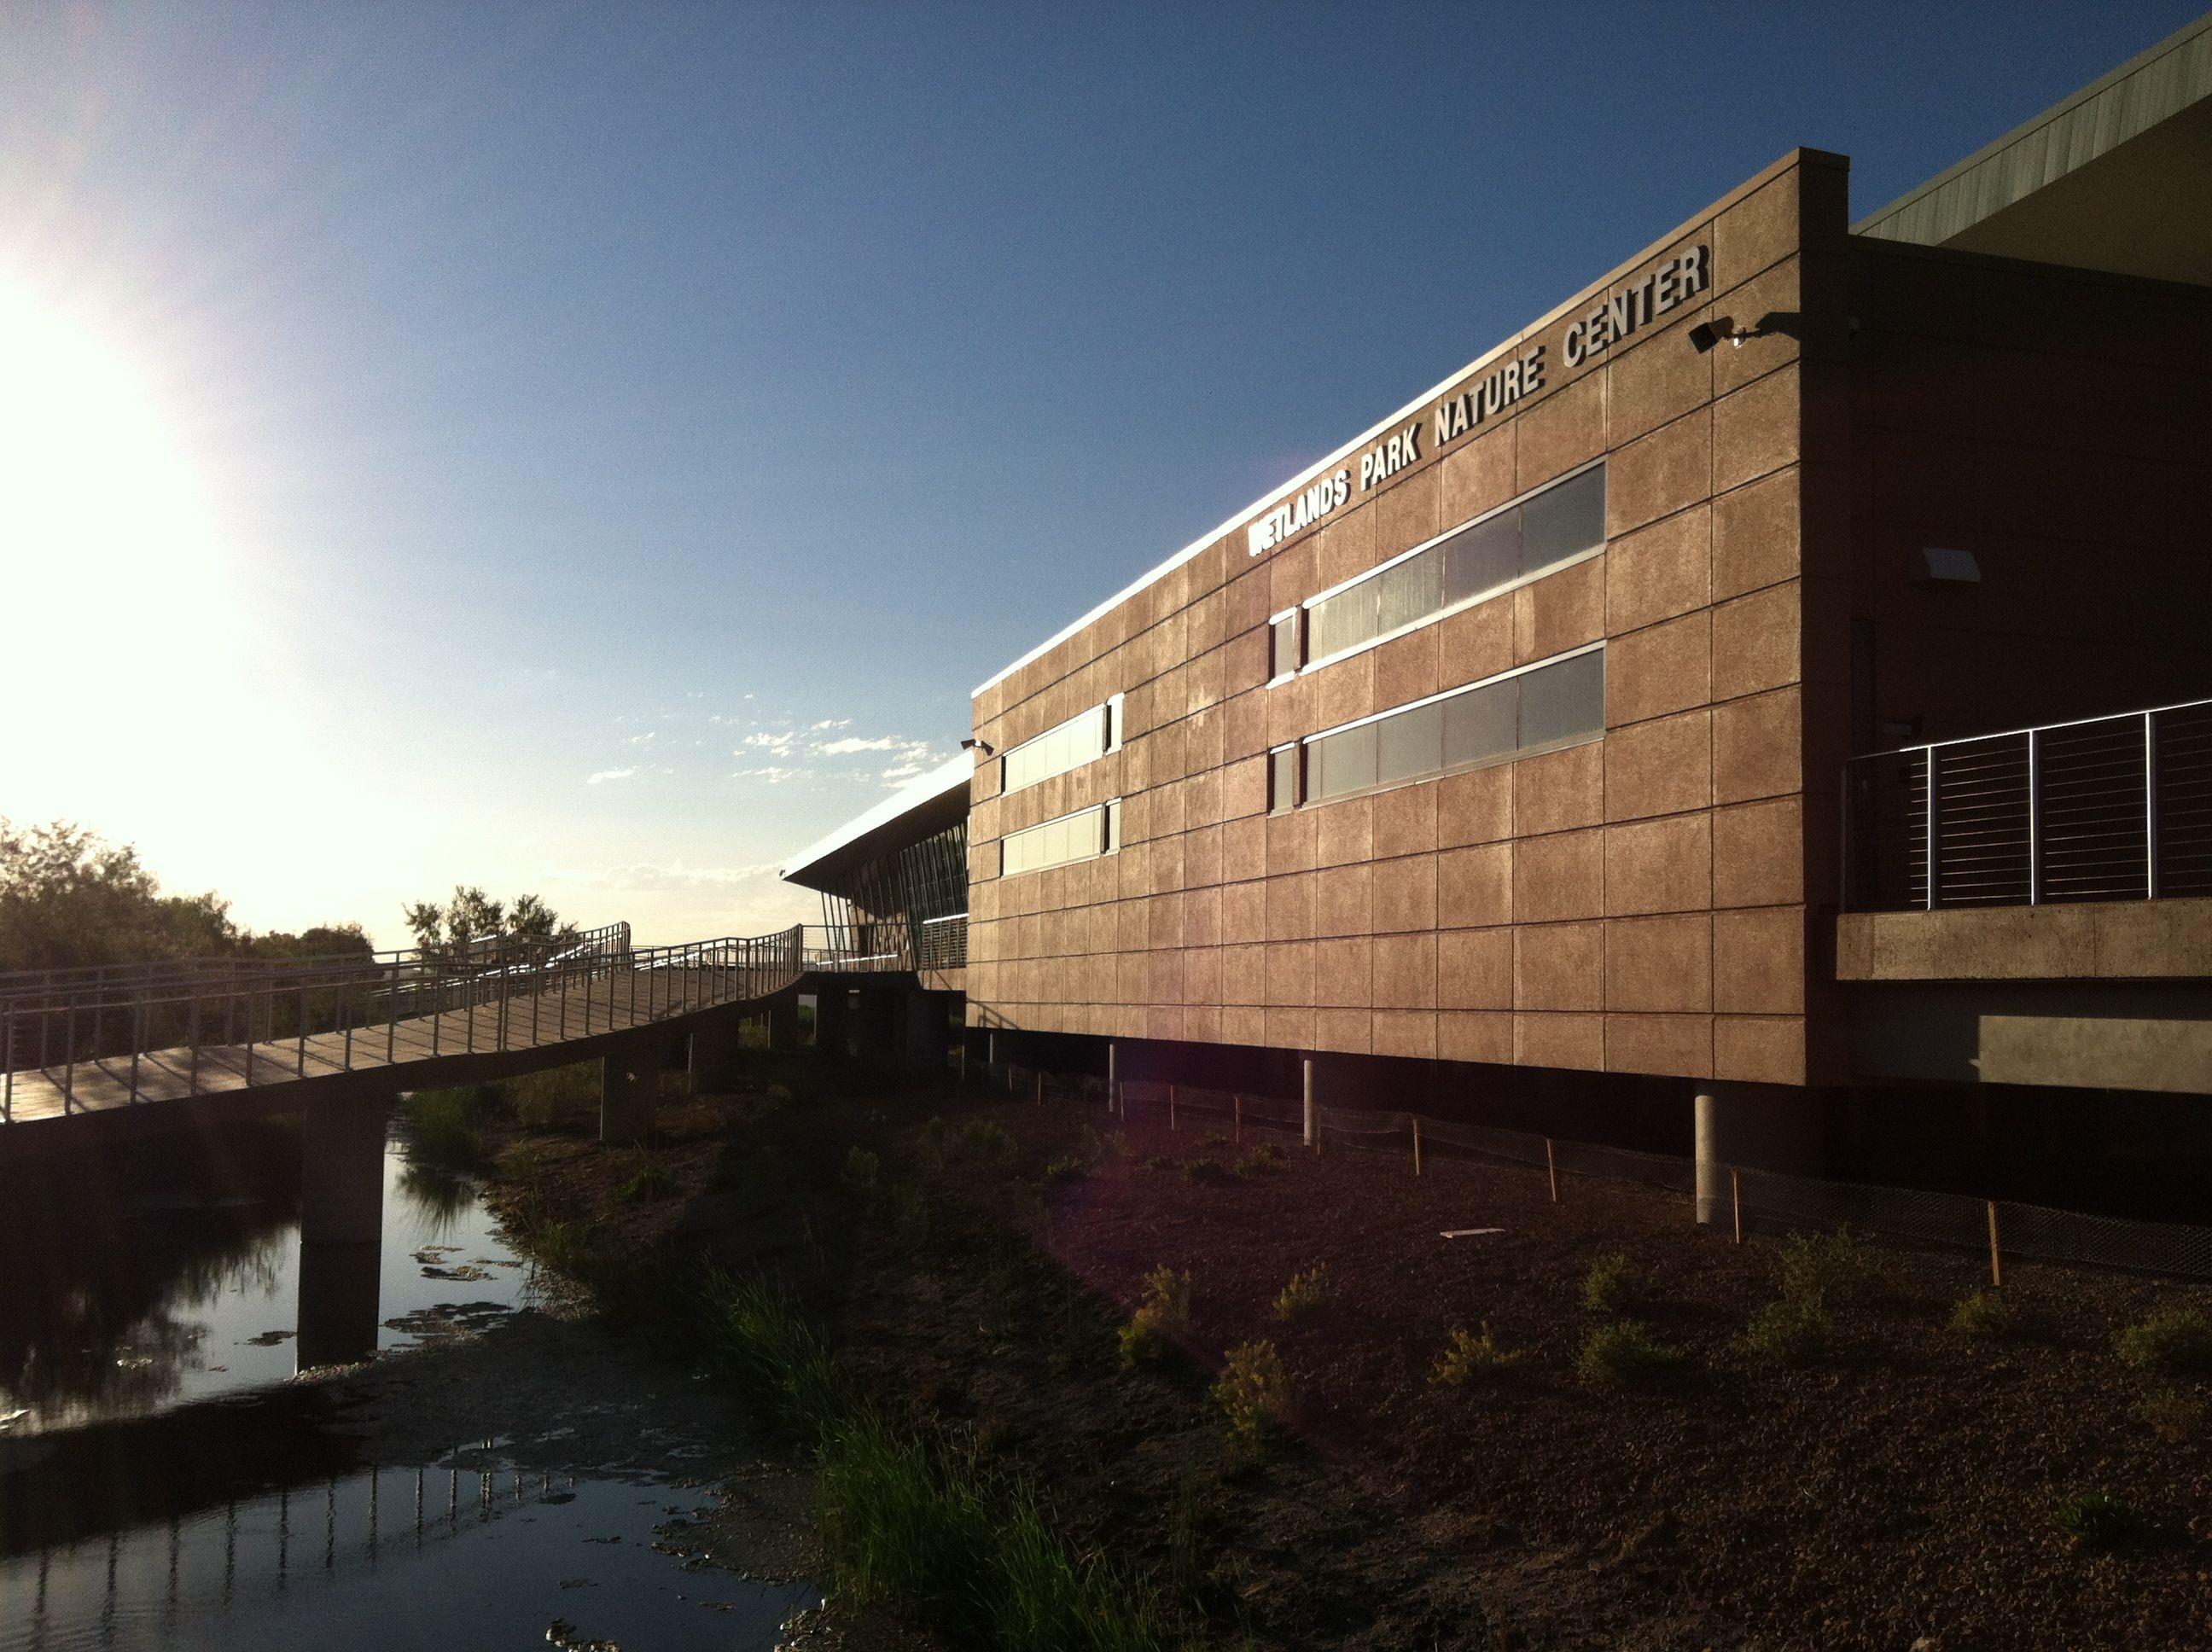 Clark County Wetlands Nature Center